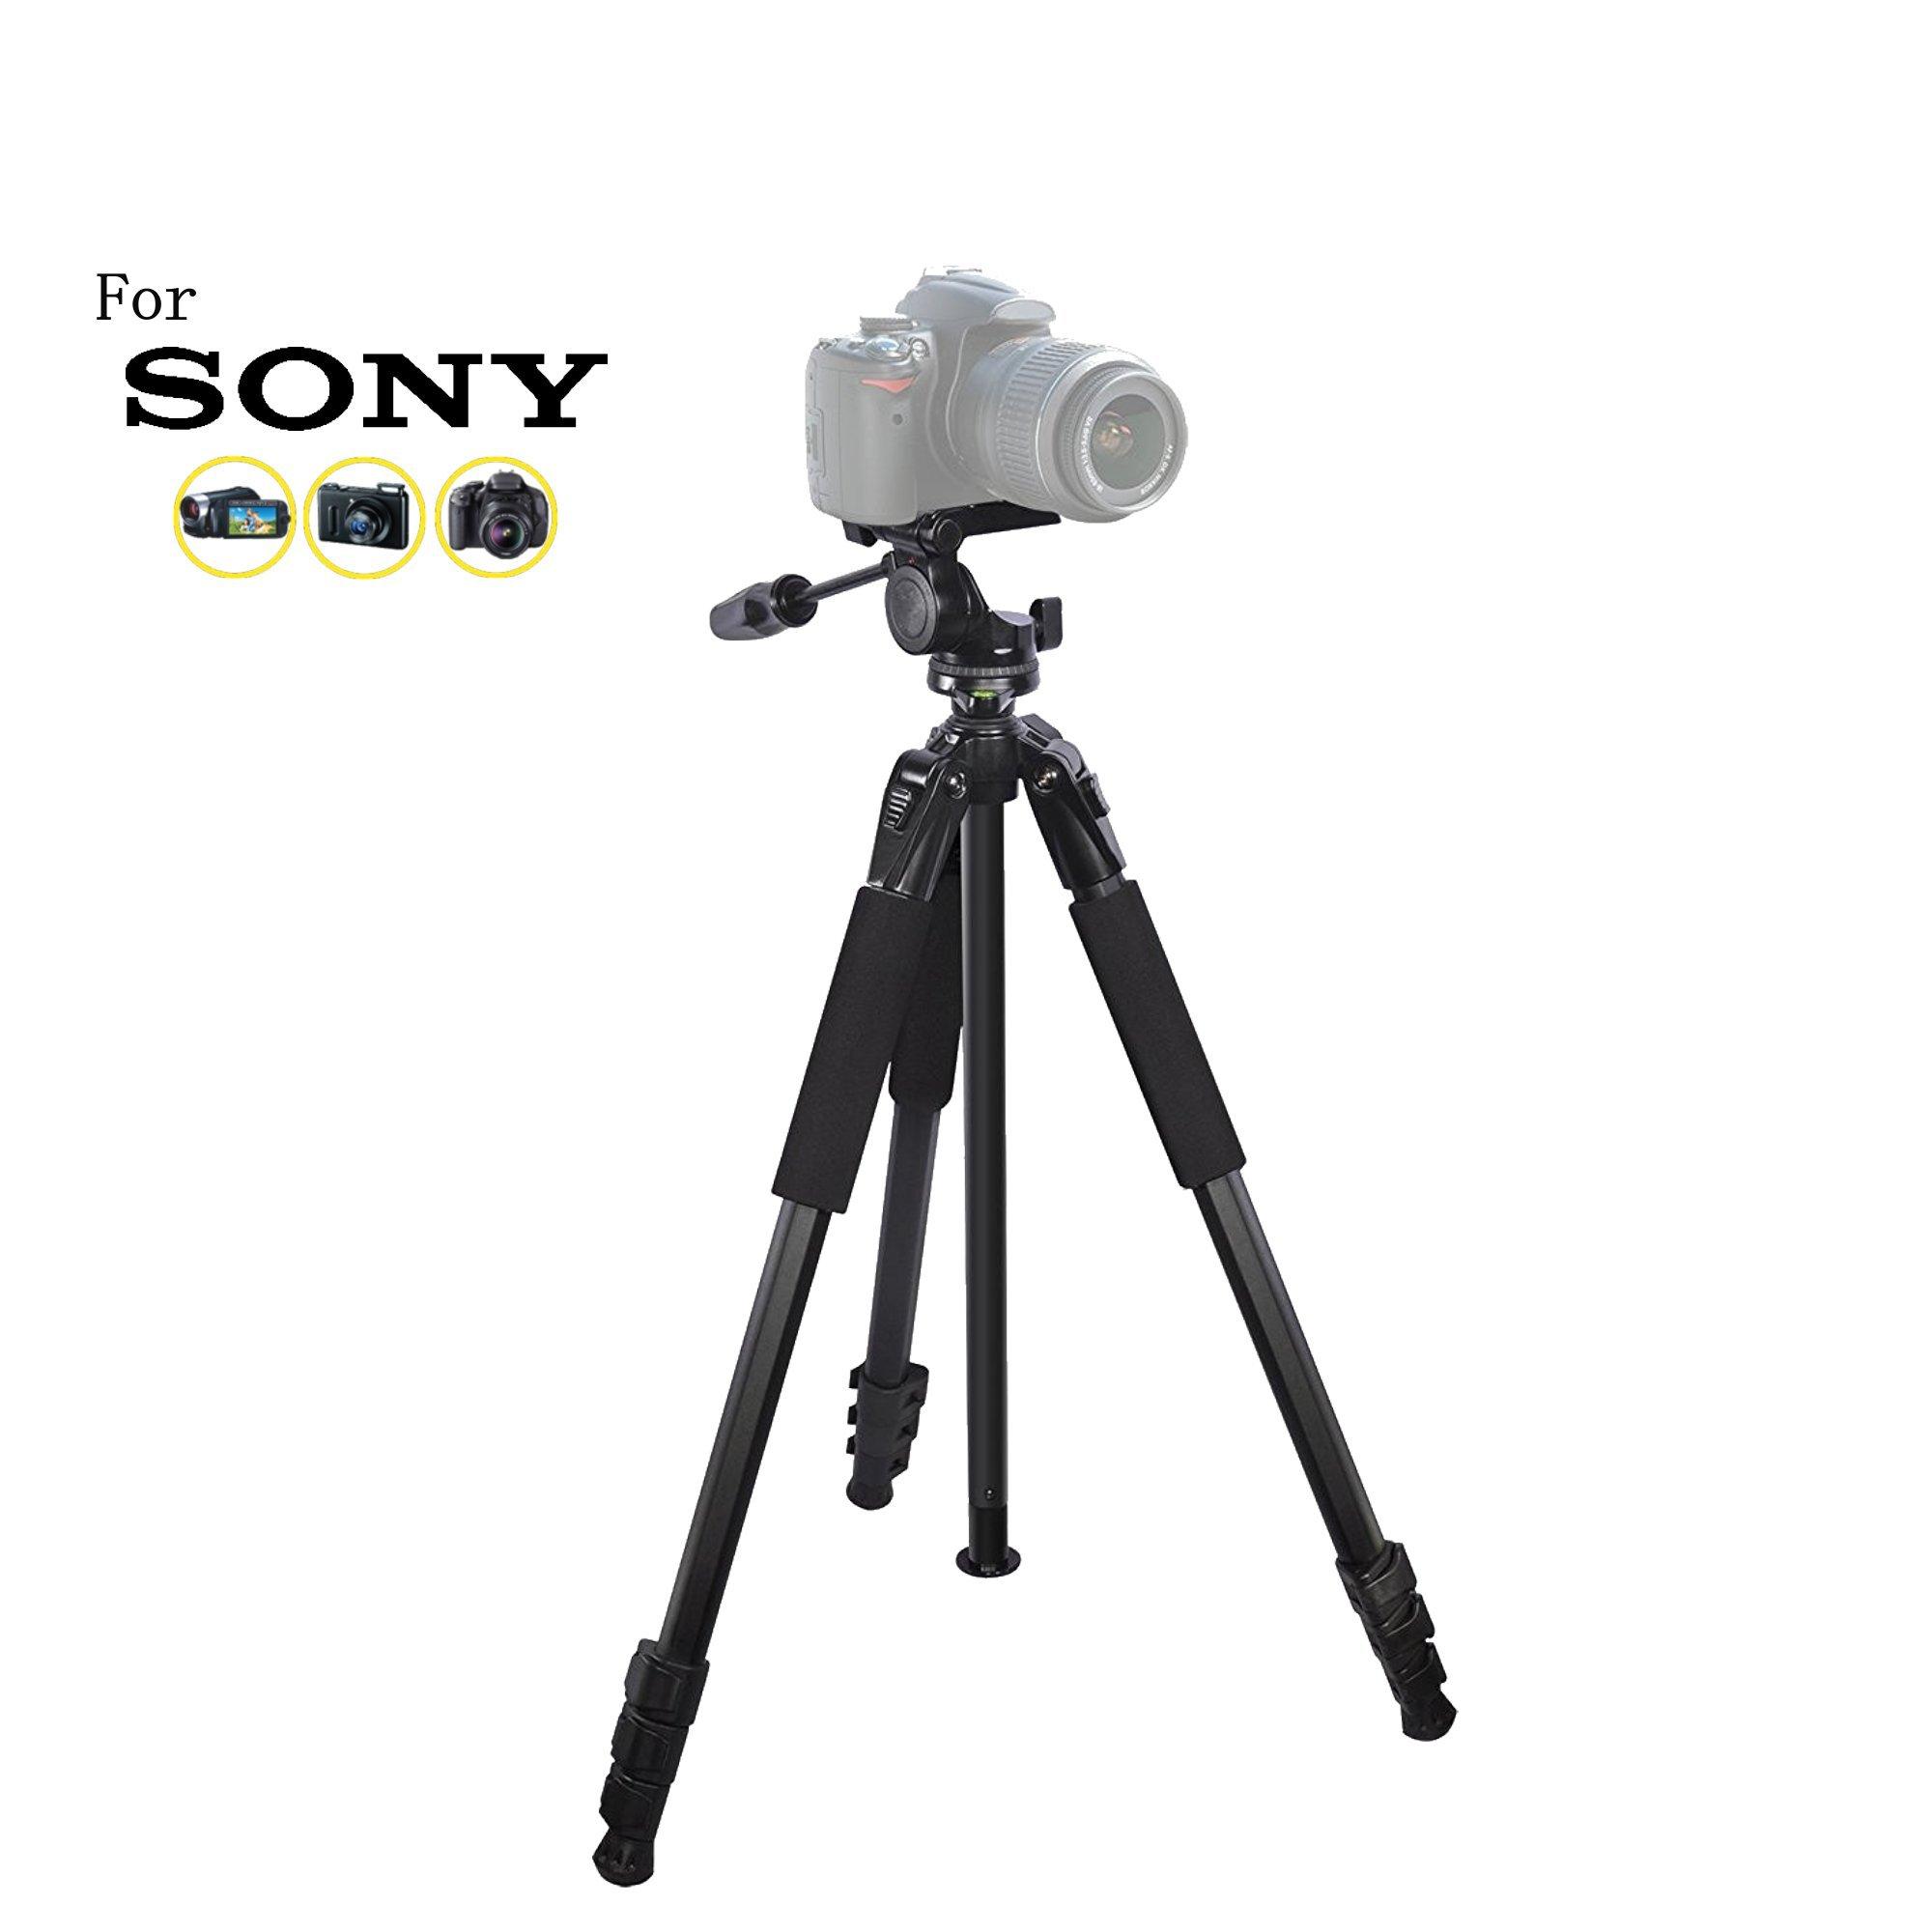 80 inch Heavy Duty Portable tripod for Sony Cyber-shot DSC-R1, DSC-RX1, DSC-RX10, DSC-RX10 II, DSC-RX10 III, RX10, RX100 II Pro Digital Cameras: Travel tripod by iSnapPhoto